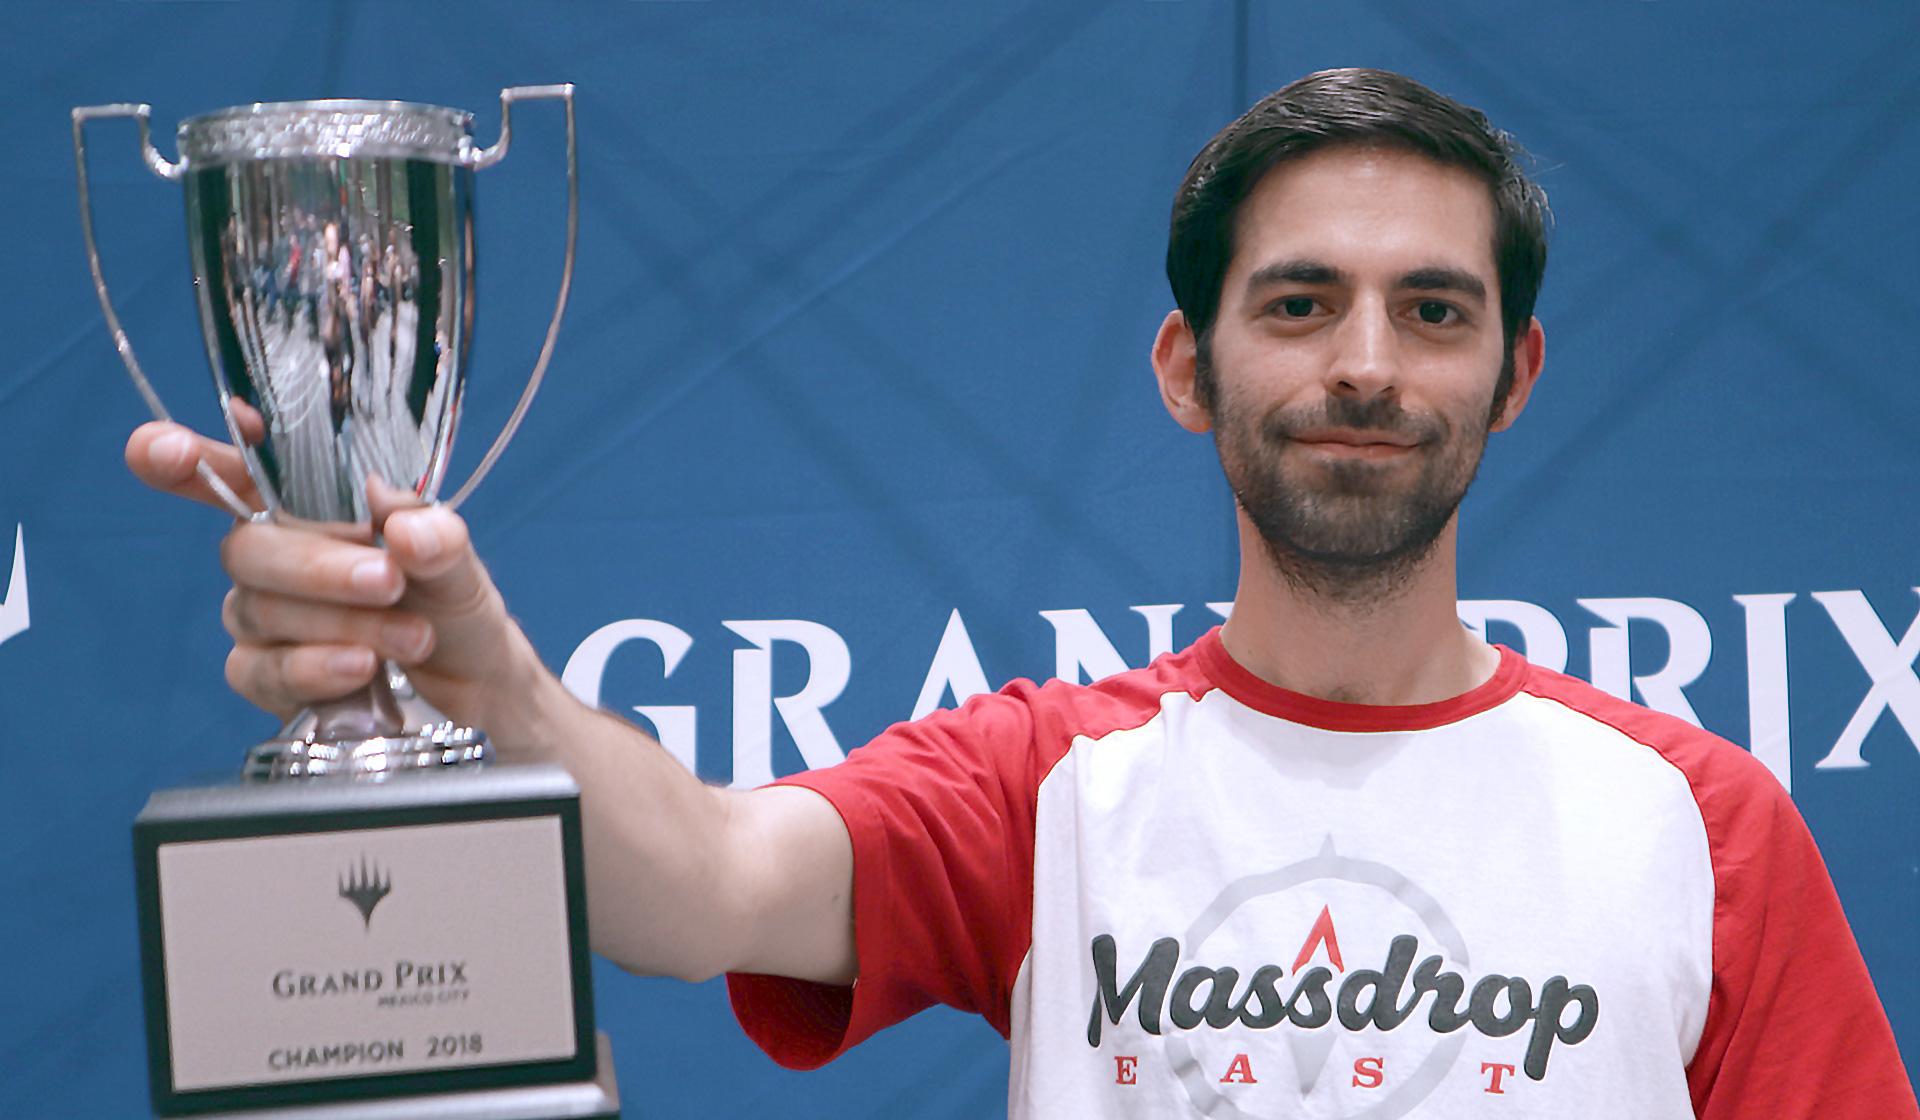 Grand Prix Mexico City 2018